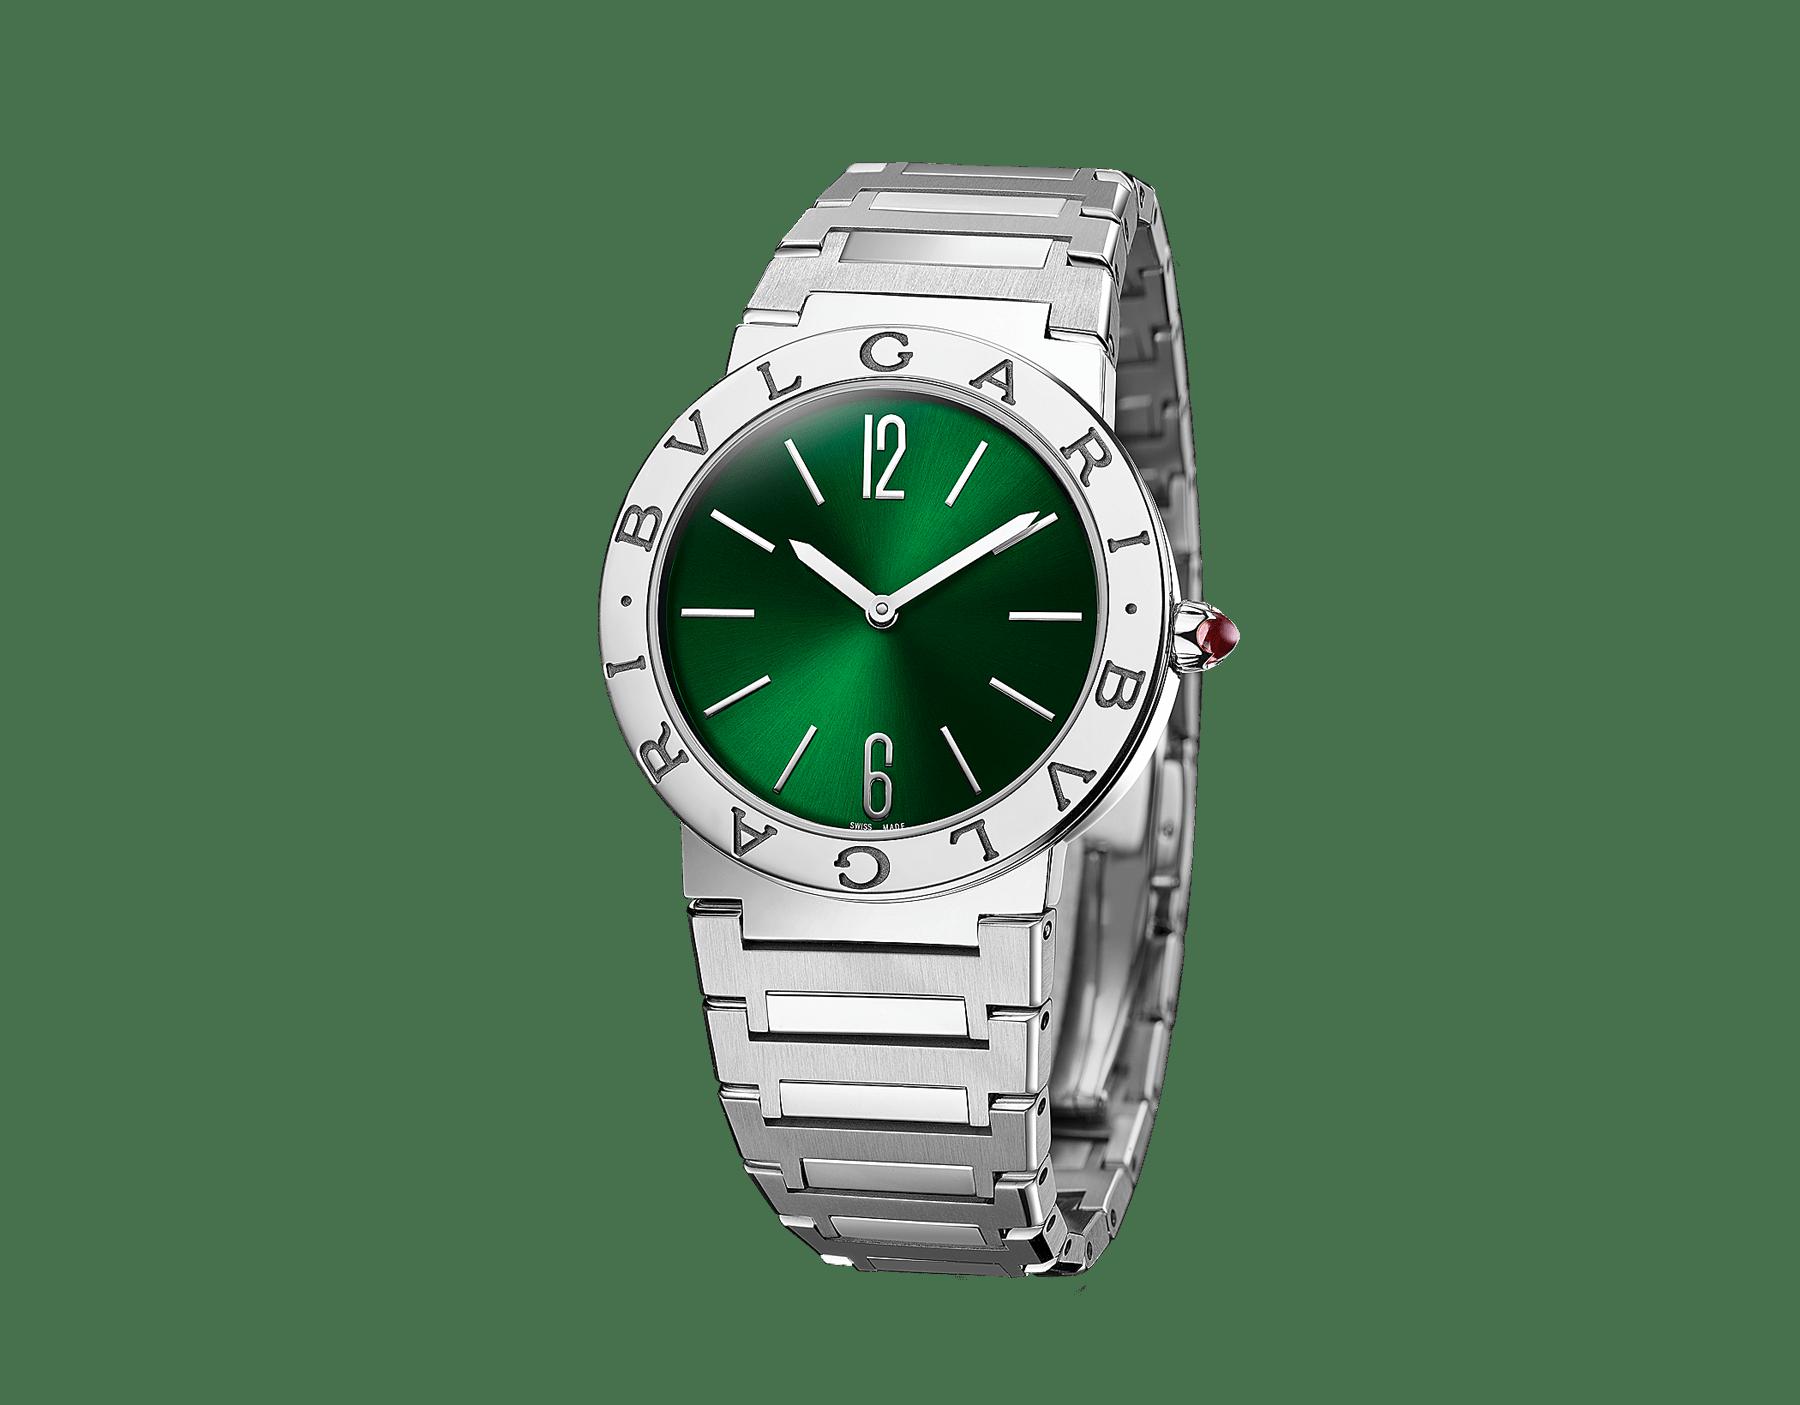 BVLGARI BVLGARI LADY 腕錶,精鋼錶殼和錶帶,精鋼錶圈鐫刻雙品牌標誌,綠色太陽放射紋錶盤。 103066 image 2